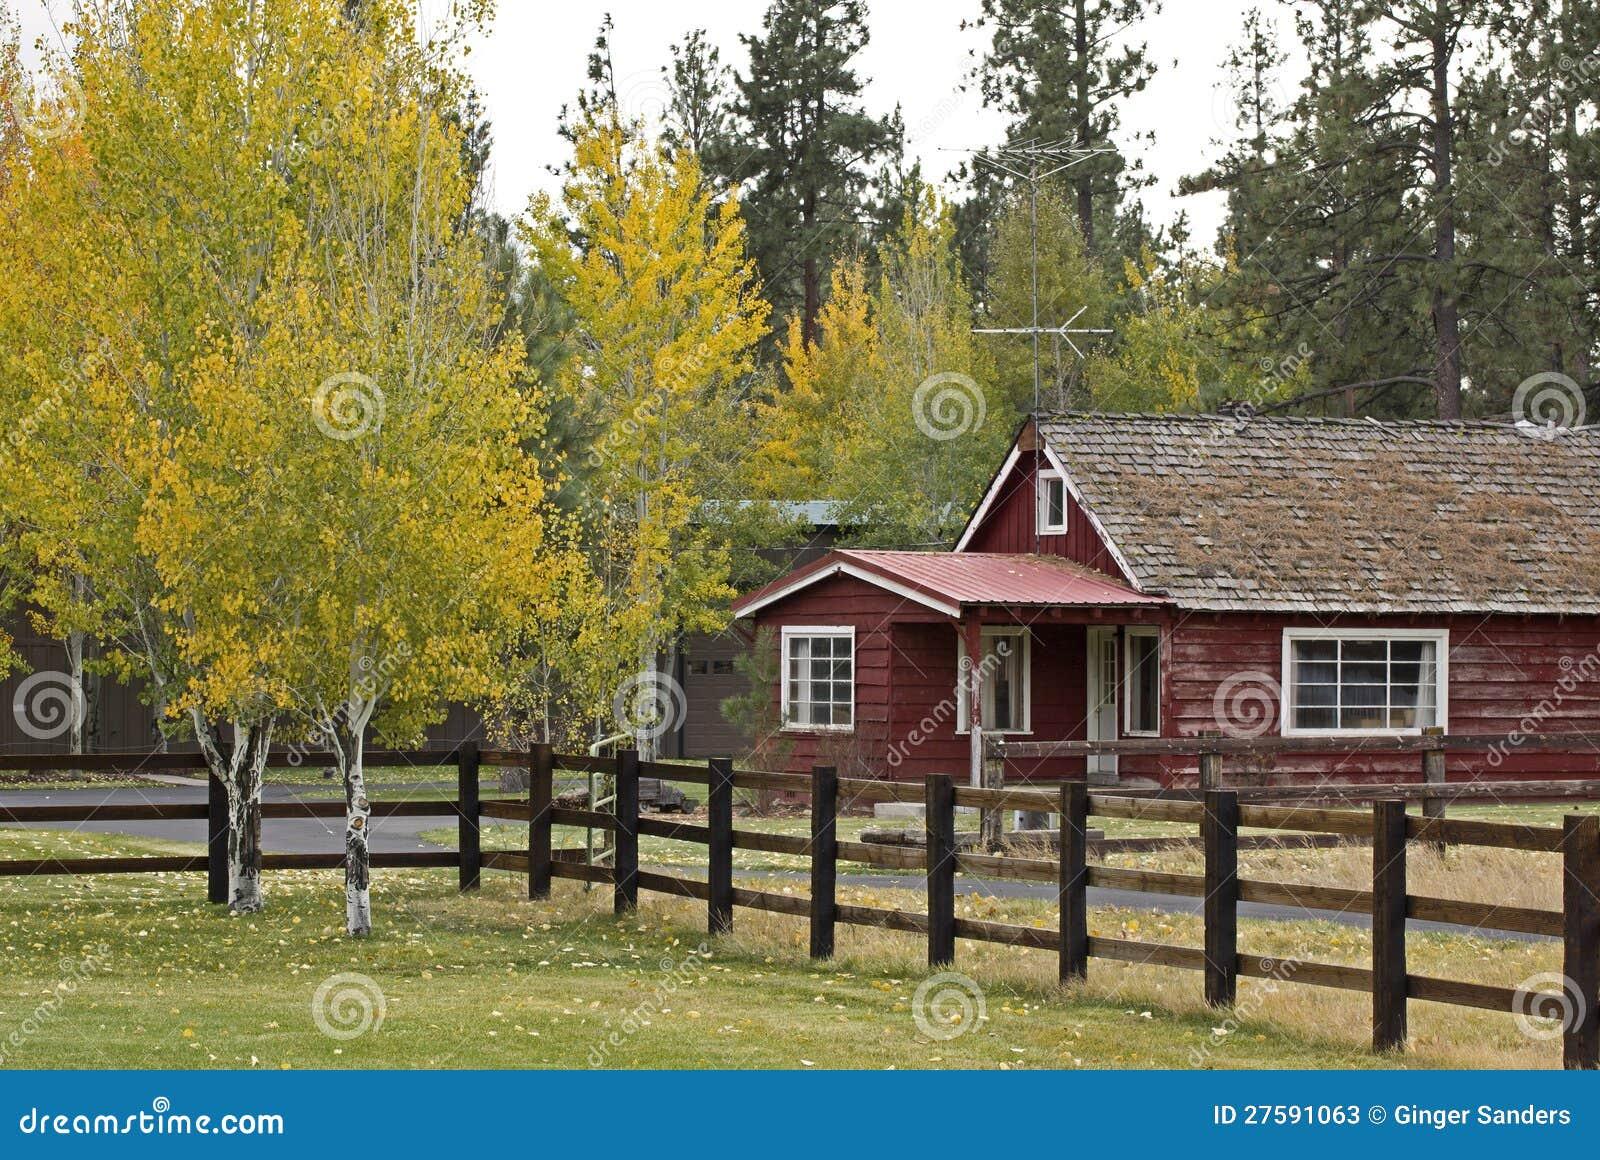 Casa De Rancho Roja De La Vendimia En Oto 241 O Imagen De